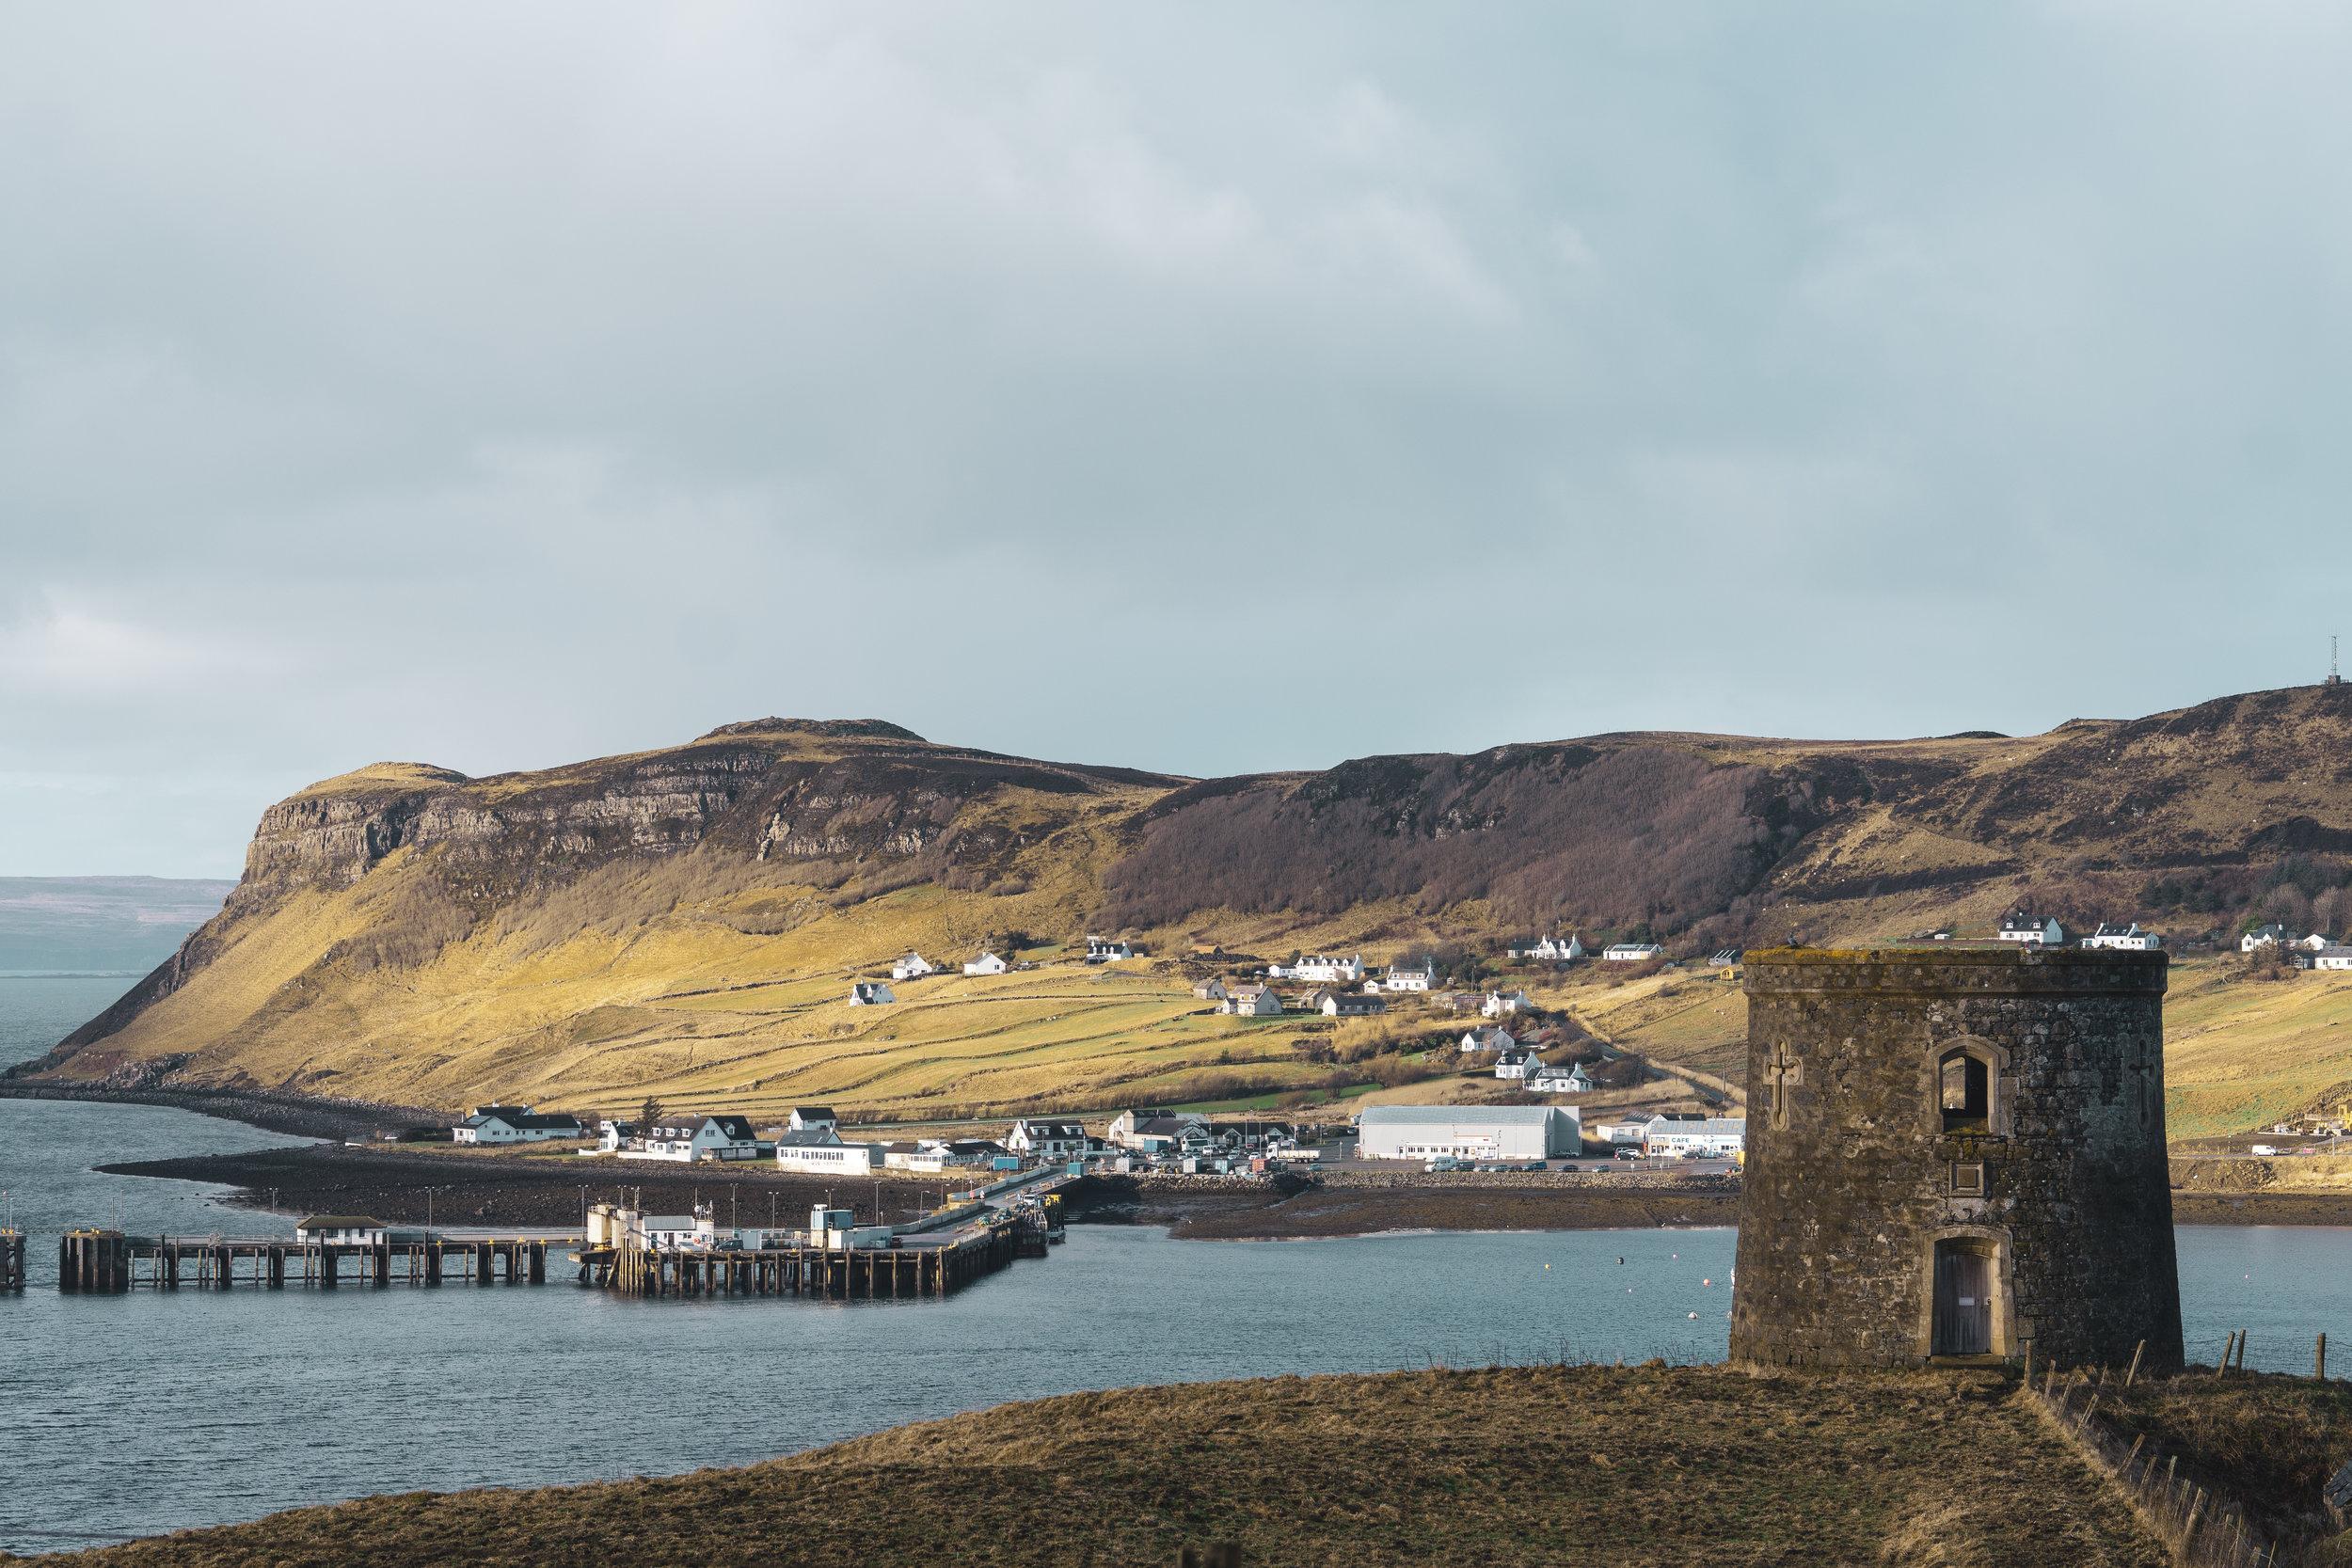 Isle-of-Skye-Fairy-Glen-und-Braes (7).jpg